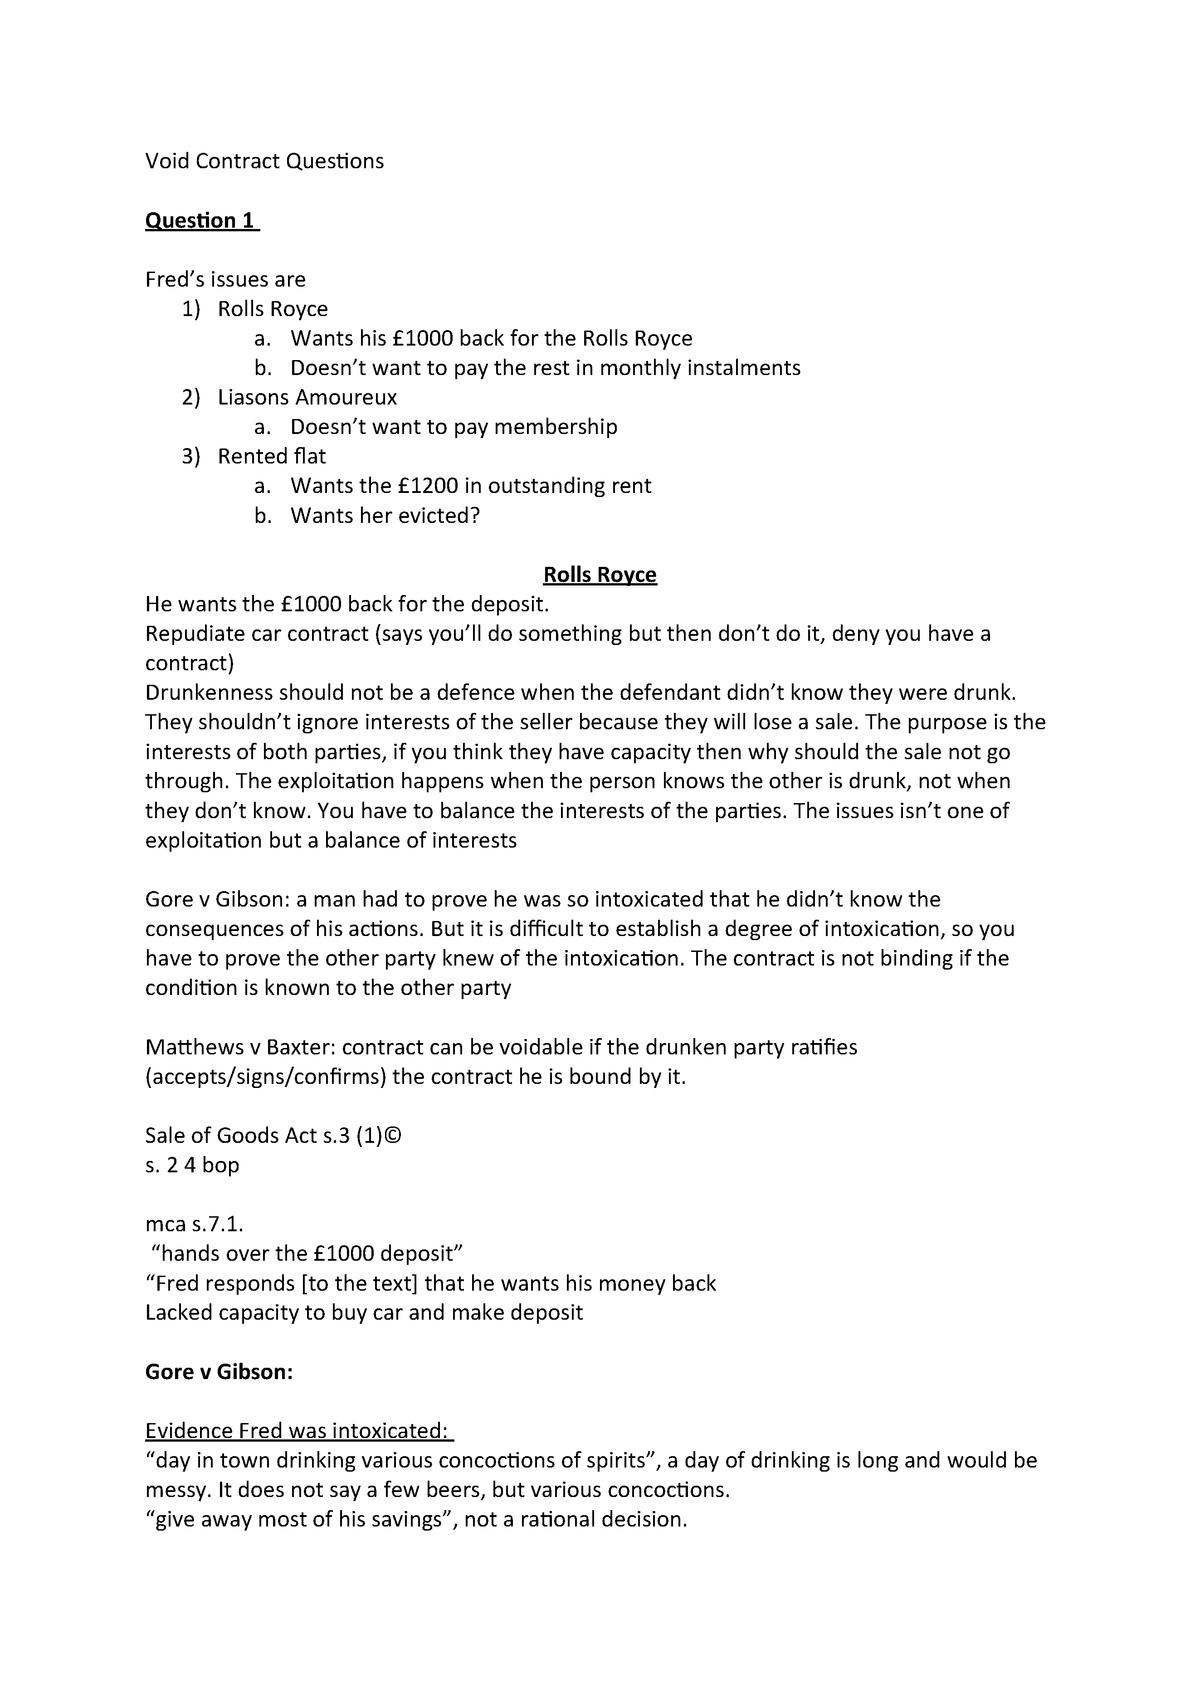 Void Contract Questions - LAW 103x - Lancaster - StuDocu